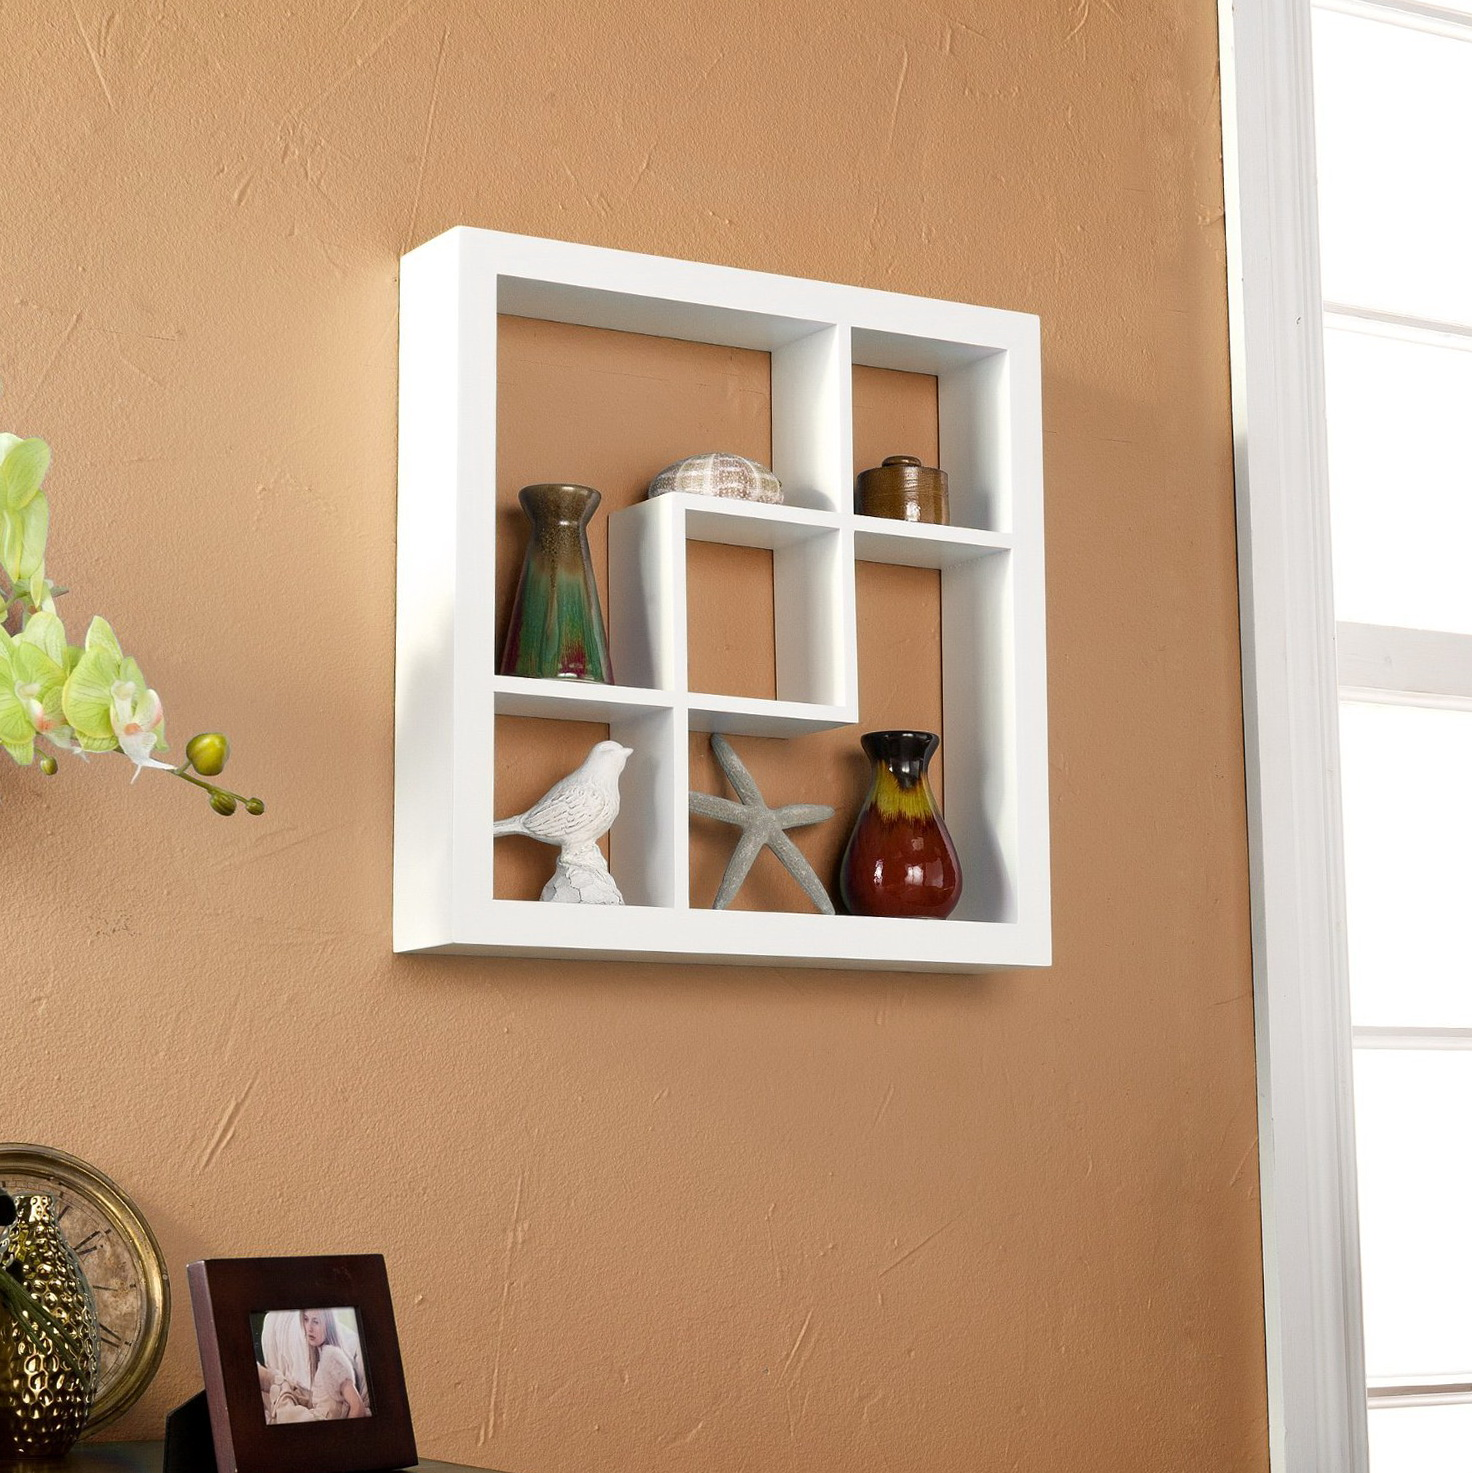 Decorative Cube Wall Shelves